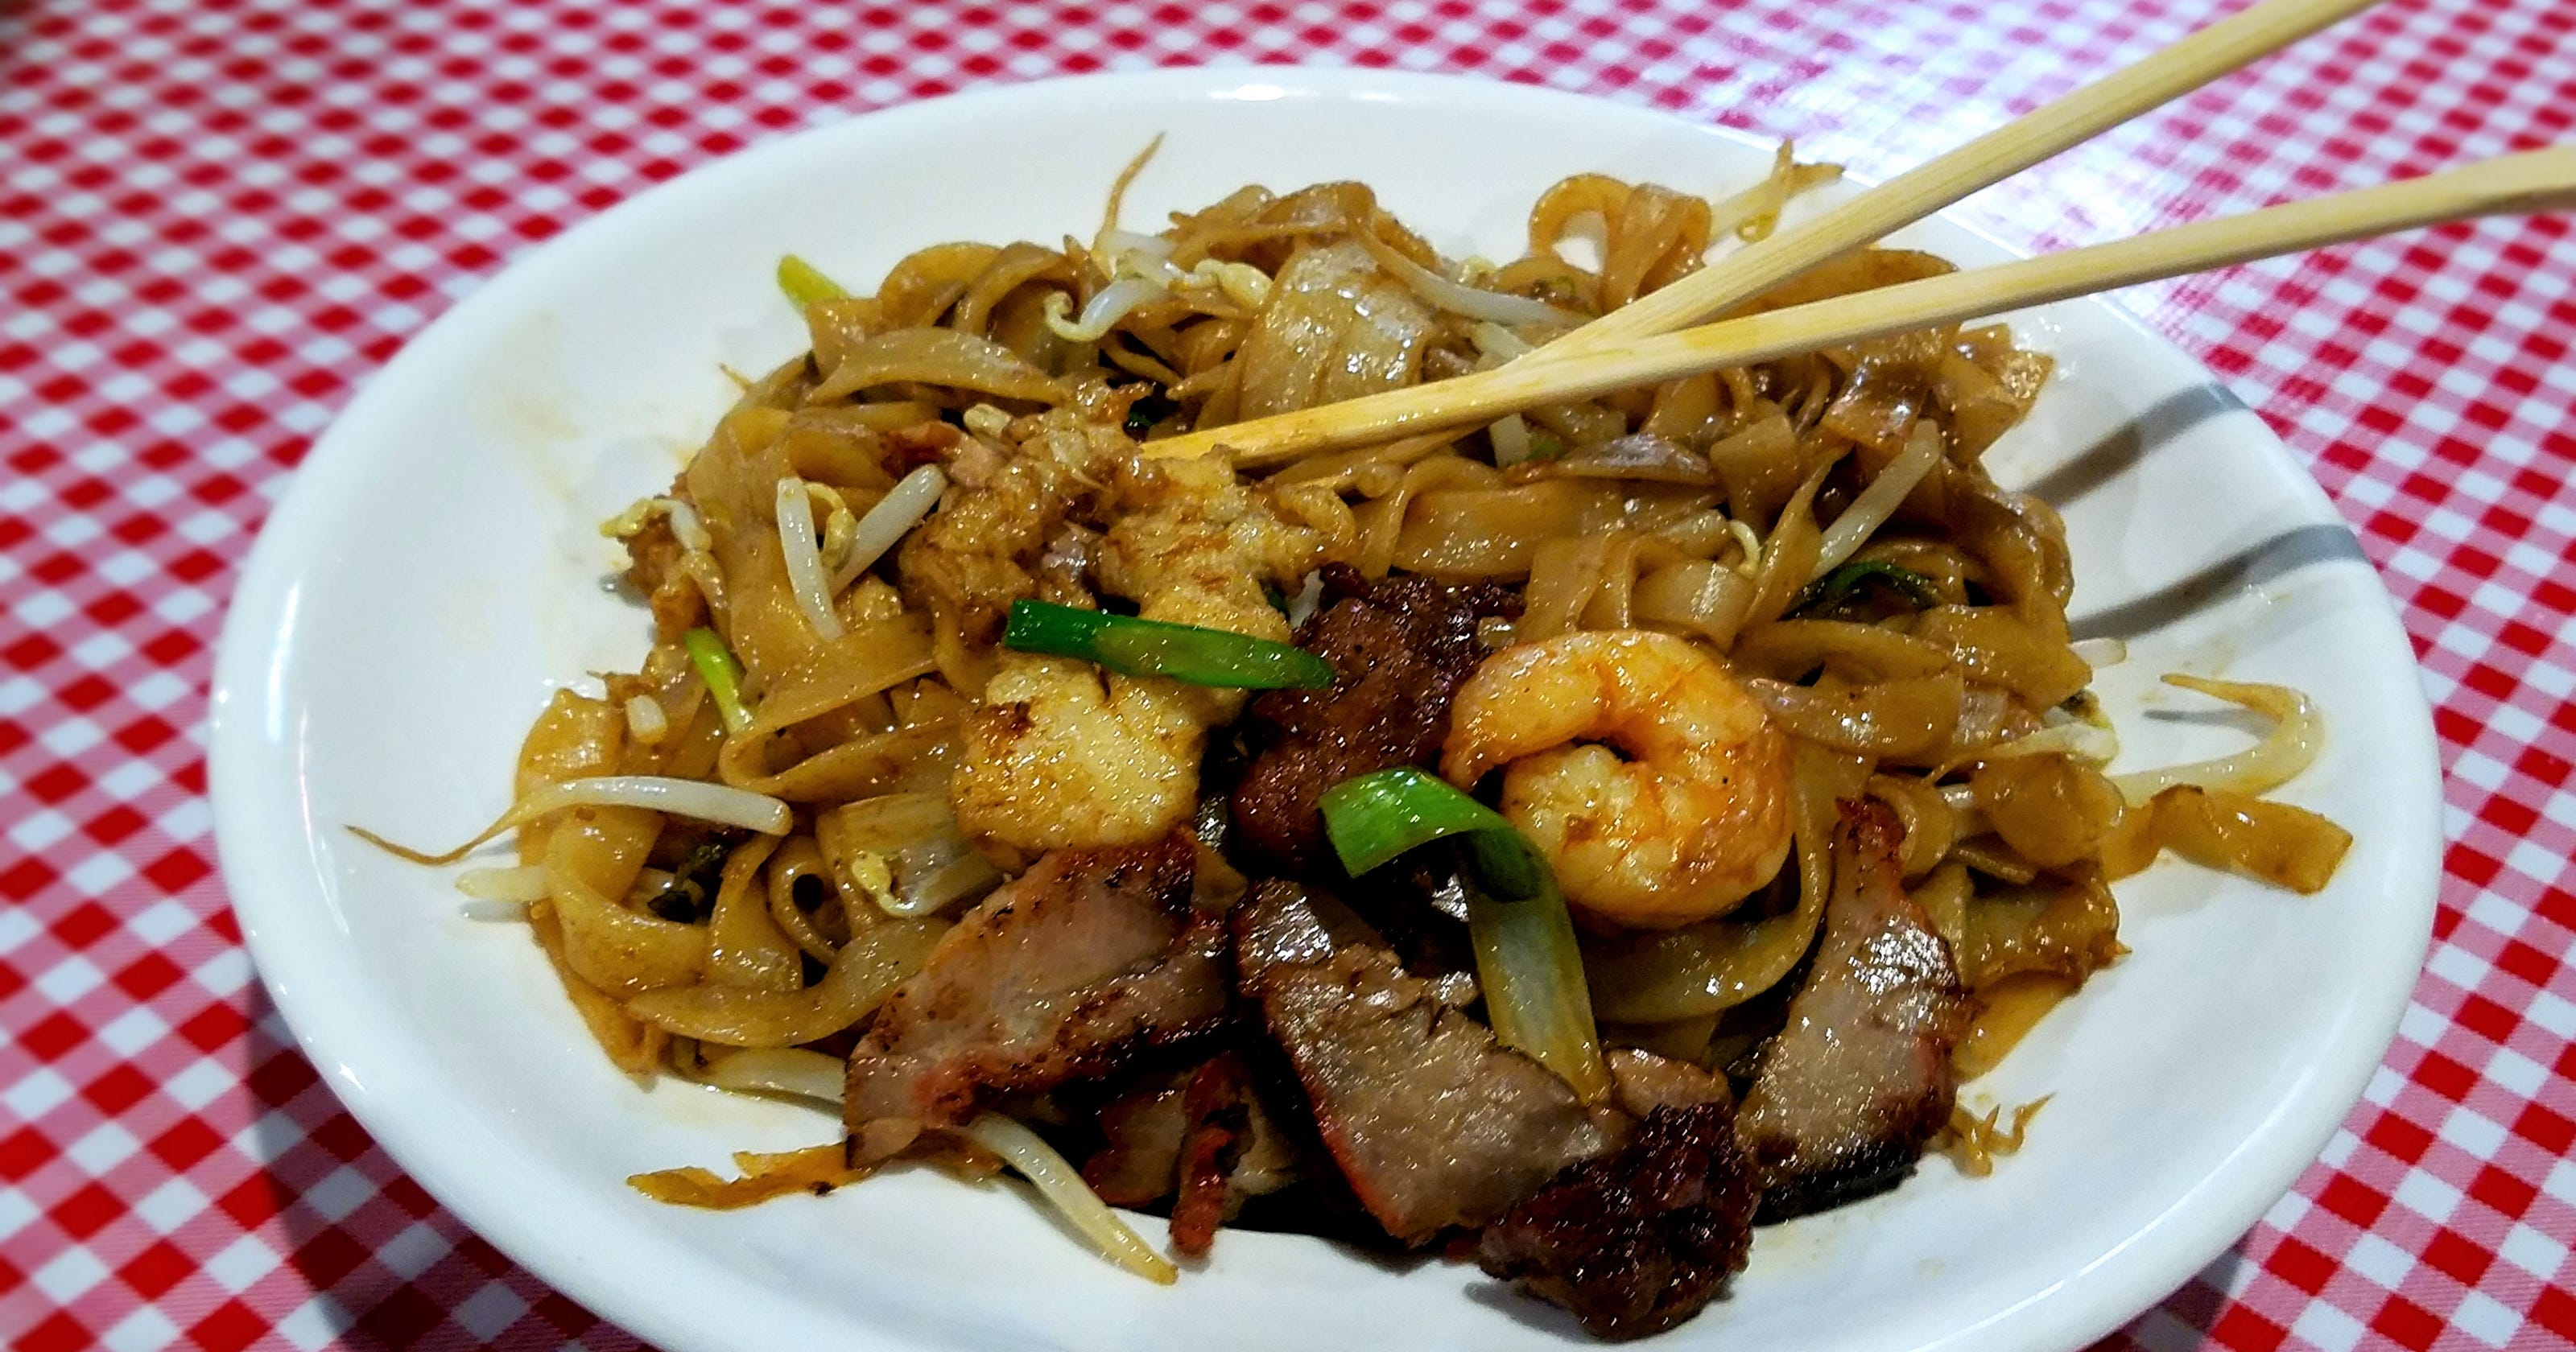 yang's shabu shabu offers many asian flavors